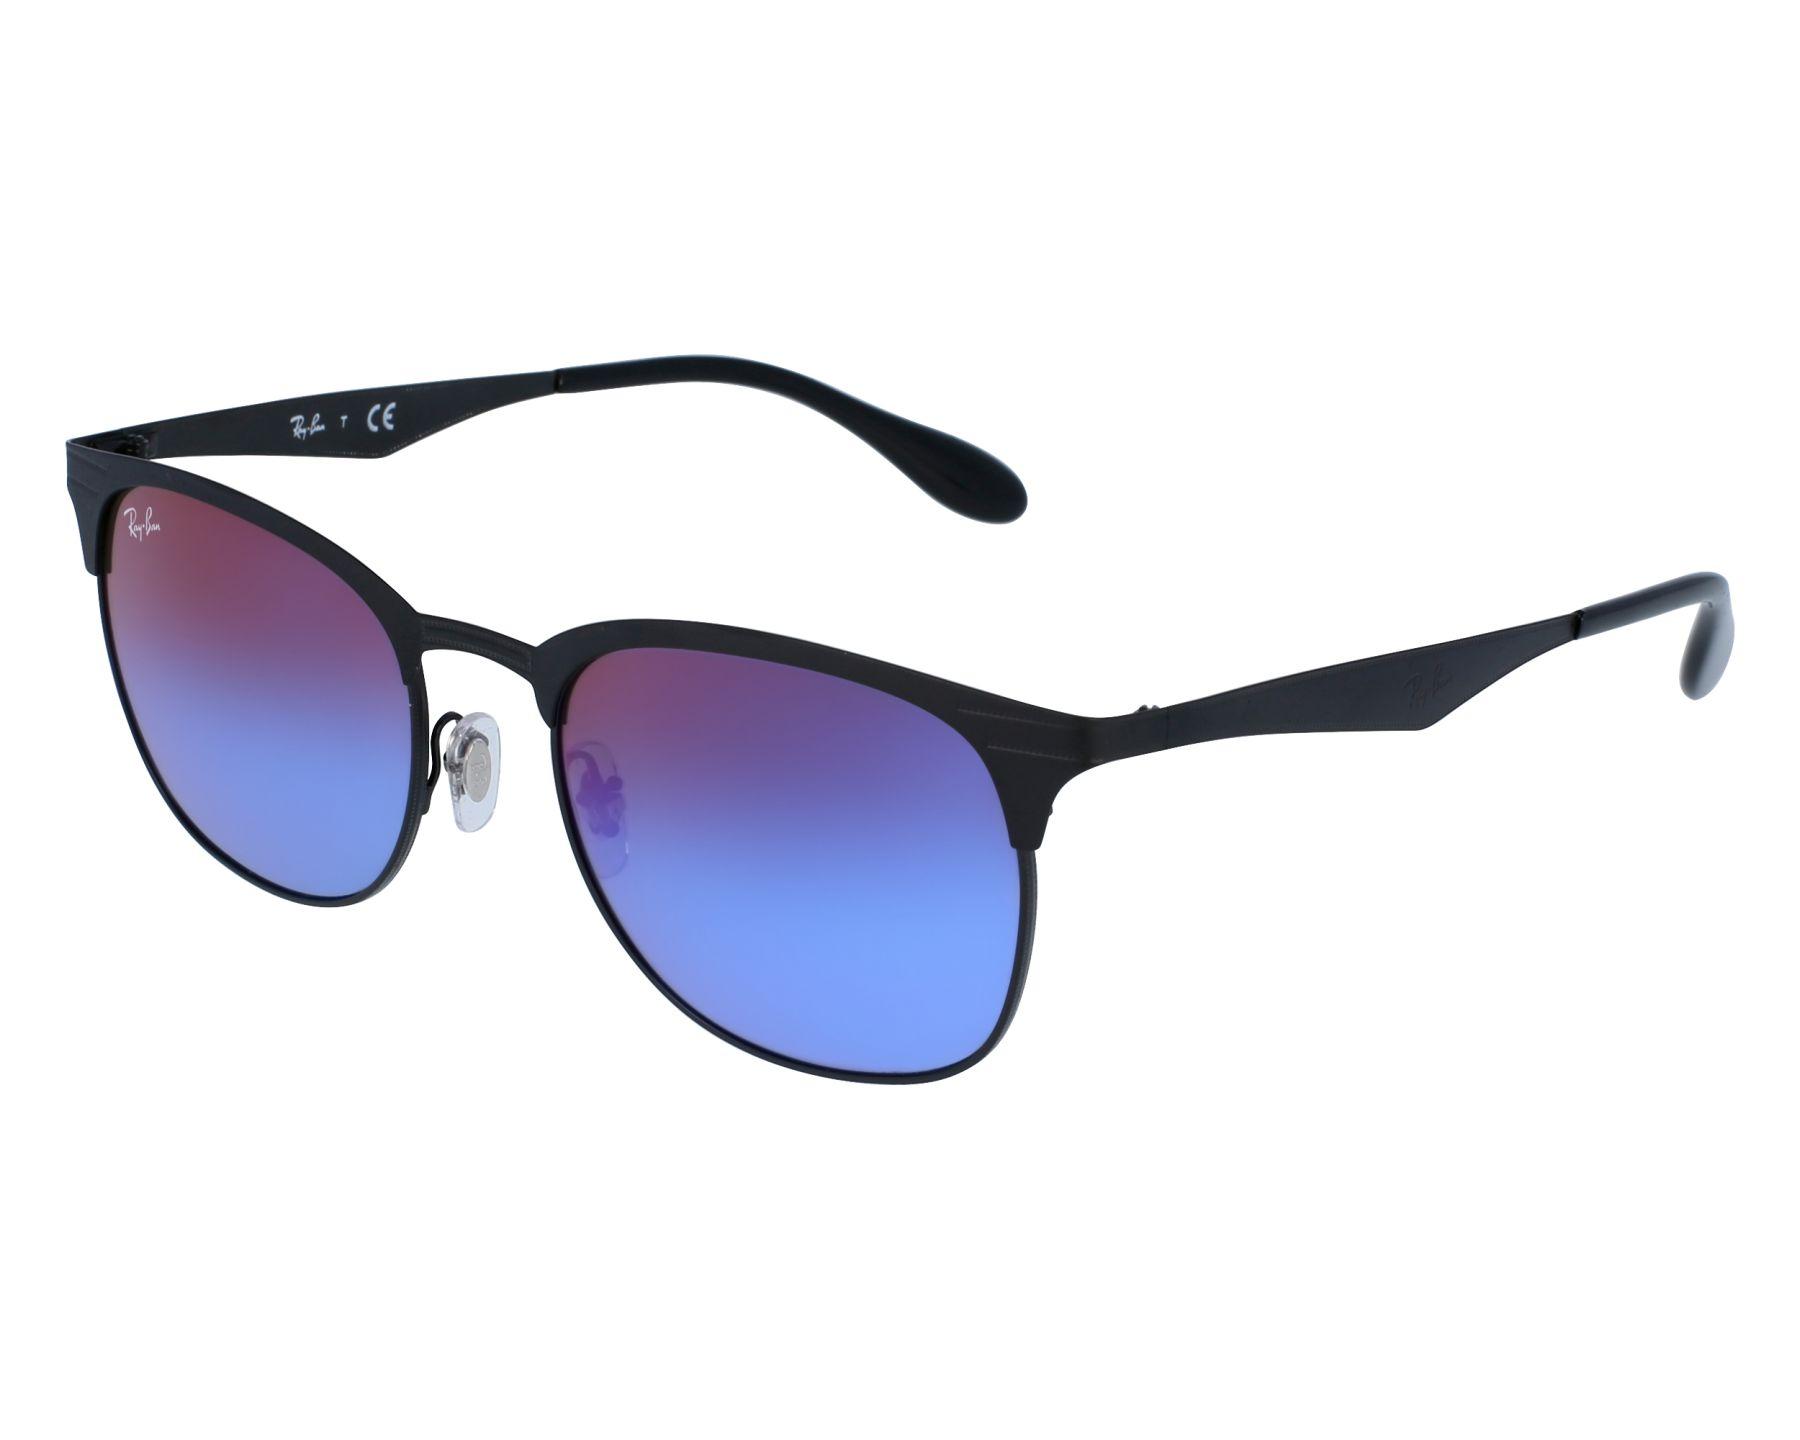 1bf787b65b2 thumbnail Sunglasses Ray-Ban RB-3538 186 B1 - Black front view